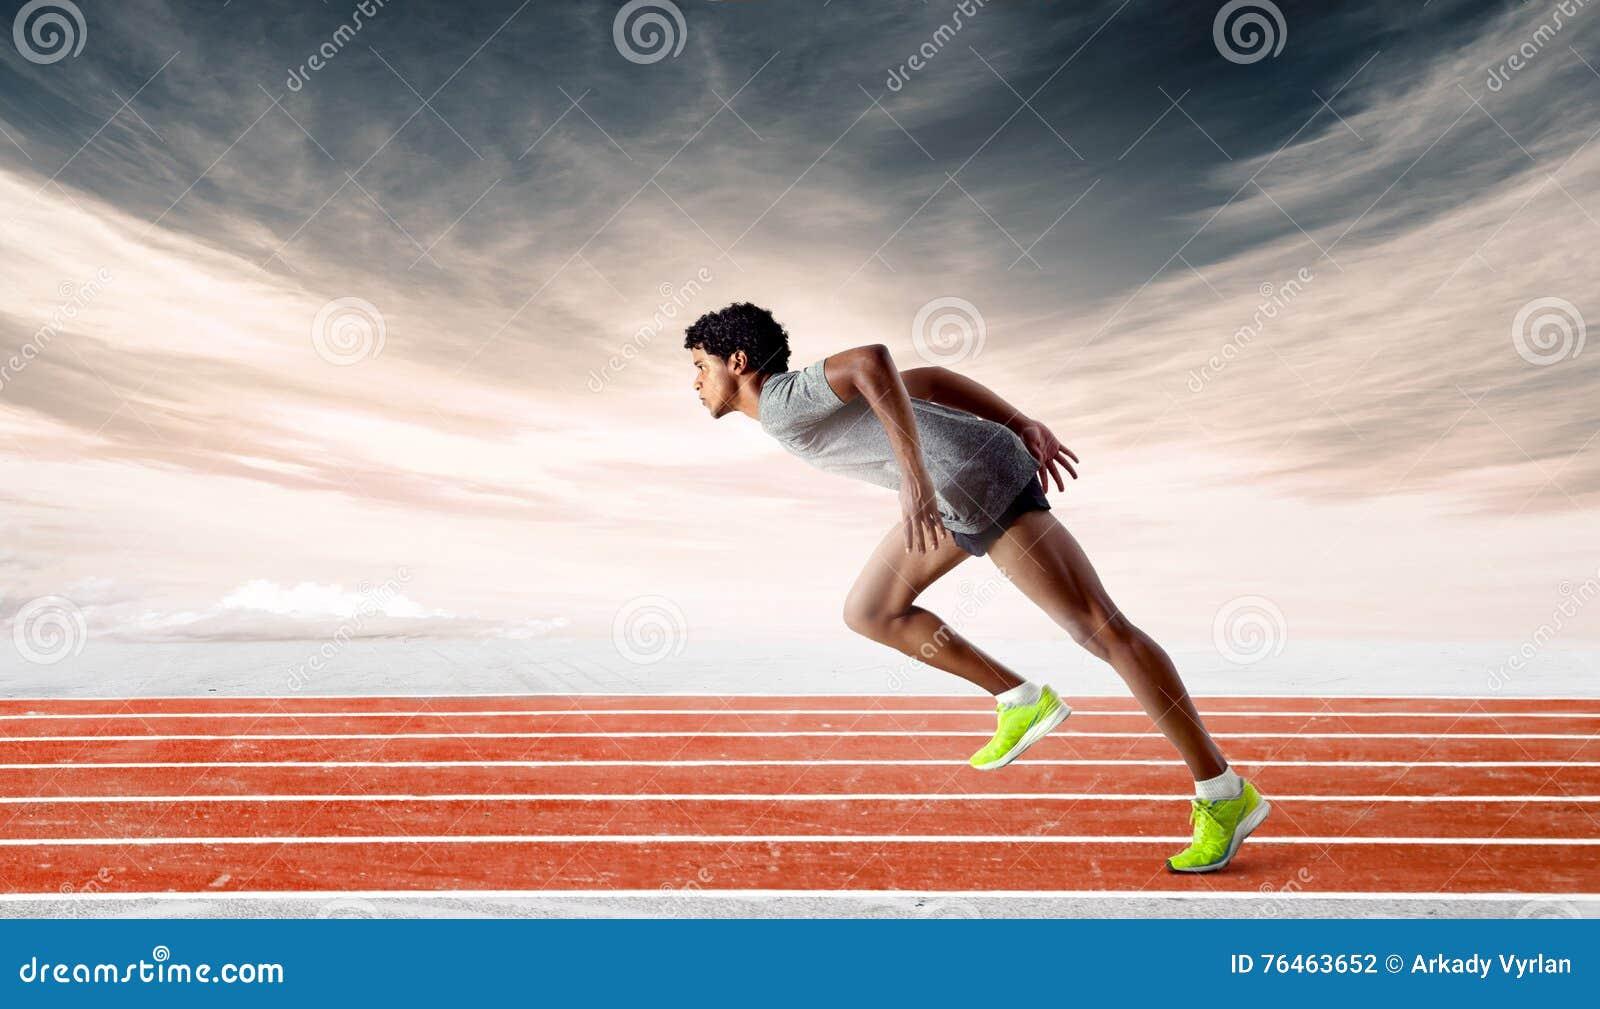 Sprinter στη διαδρομή που κλίνει προς τα εμπρός